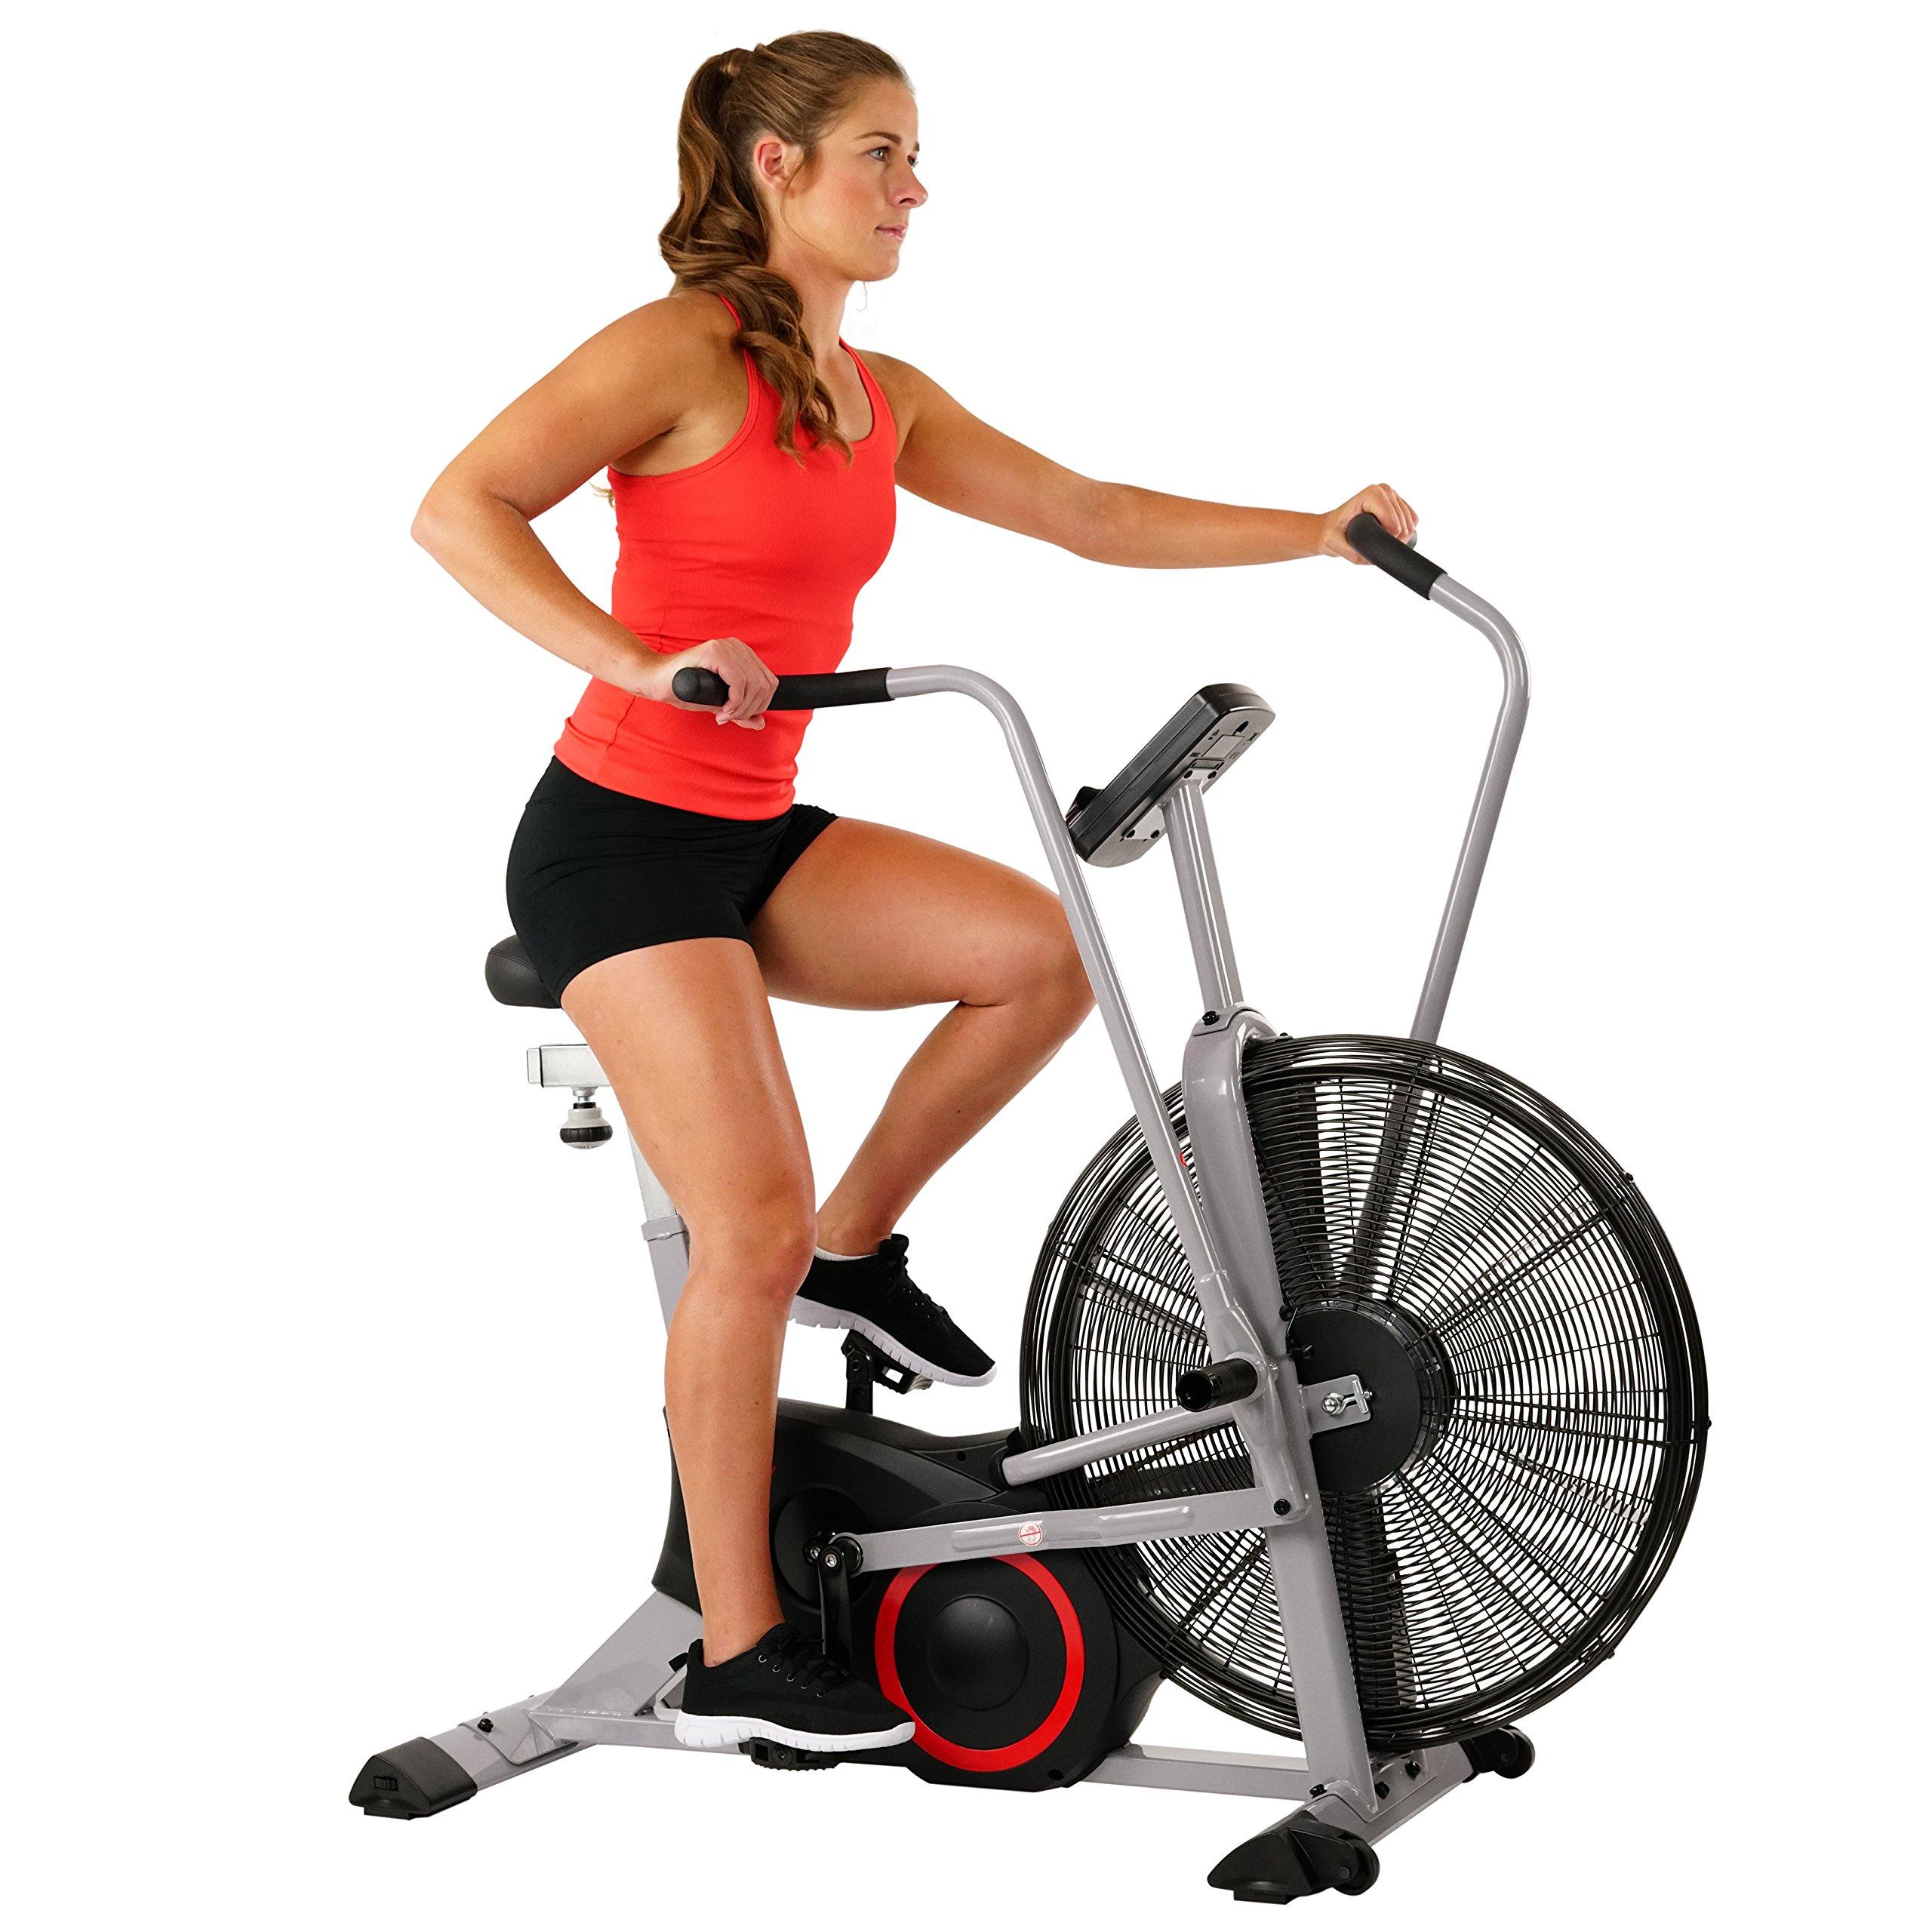 Sunny Health & Fitness SF-B2706 Exercise Fan Bike Bluetooth with Custom Workout Tornado Air Bike